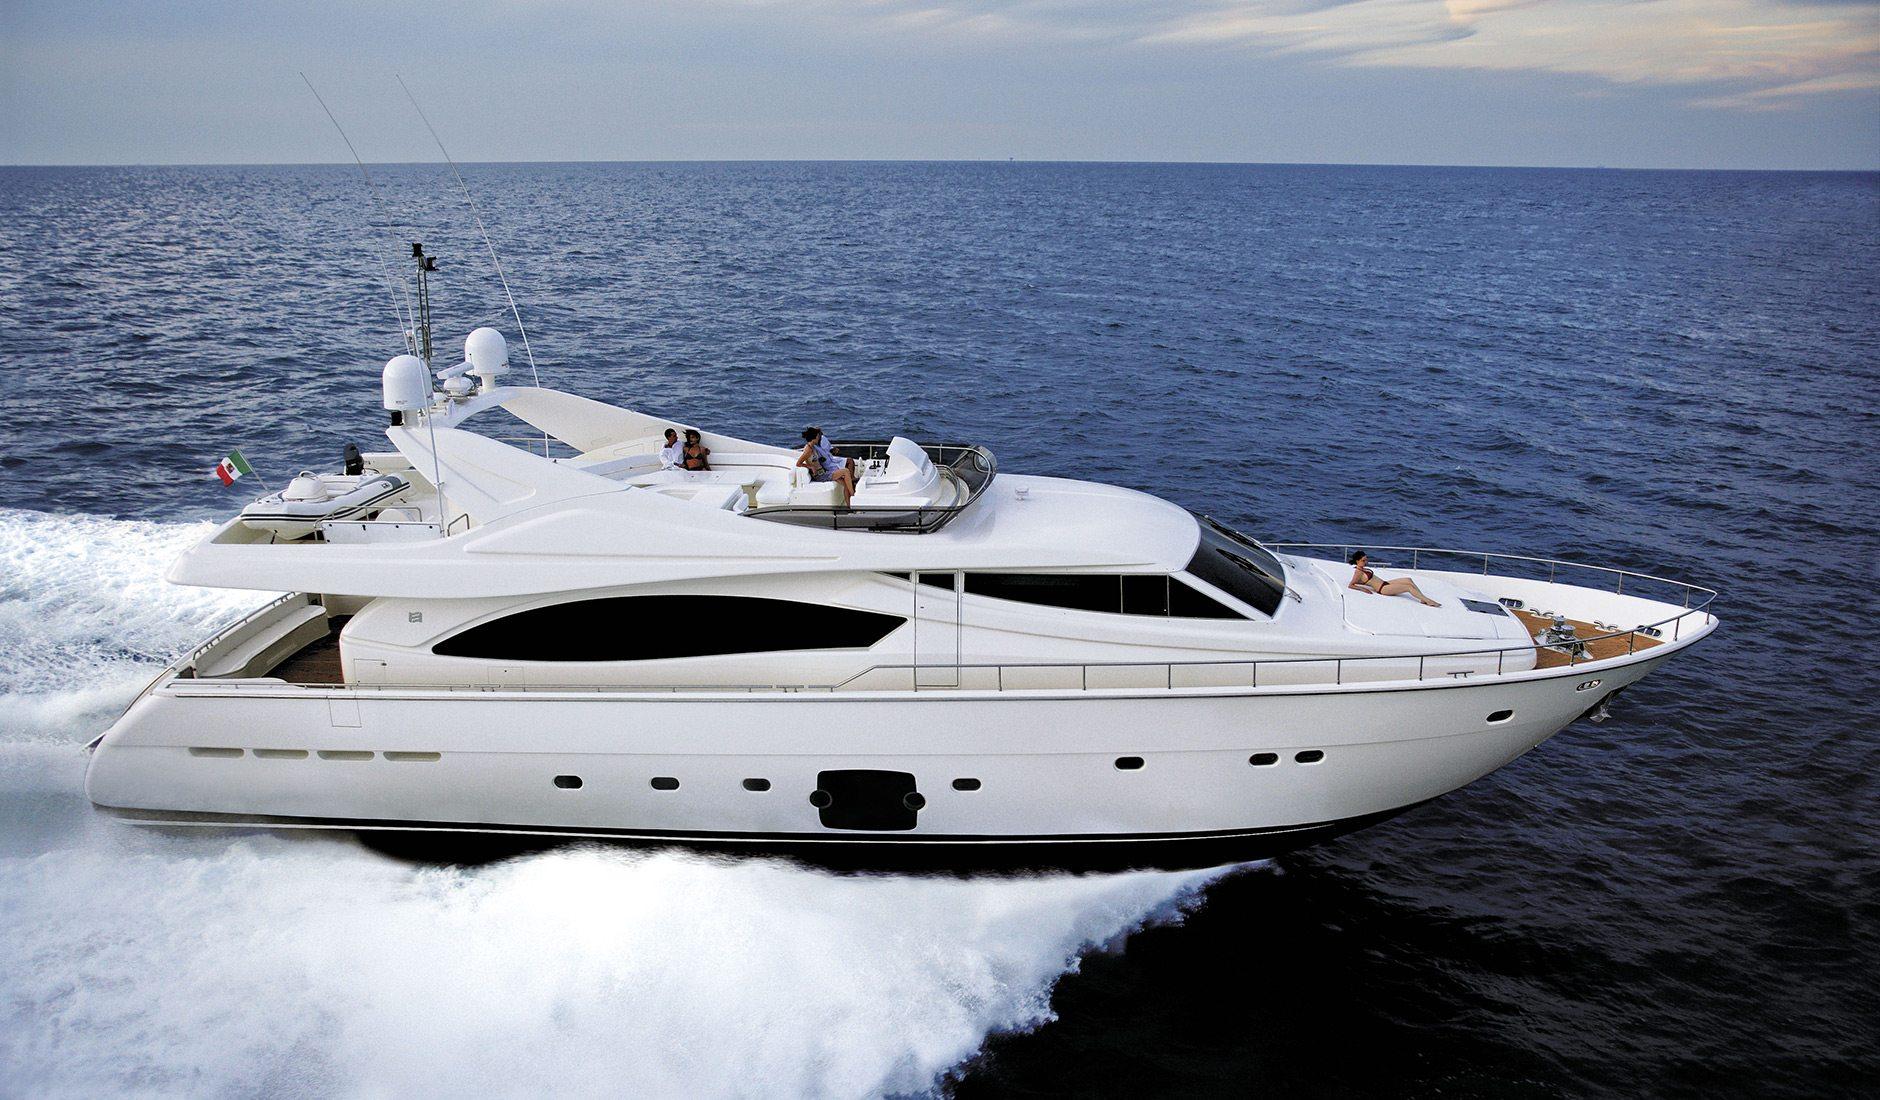 Аренда яхты FERRETTI YACHTS 881 RPH/2010